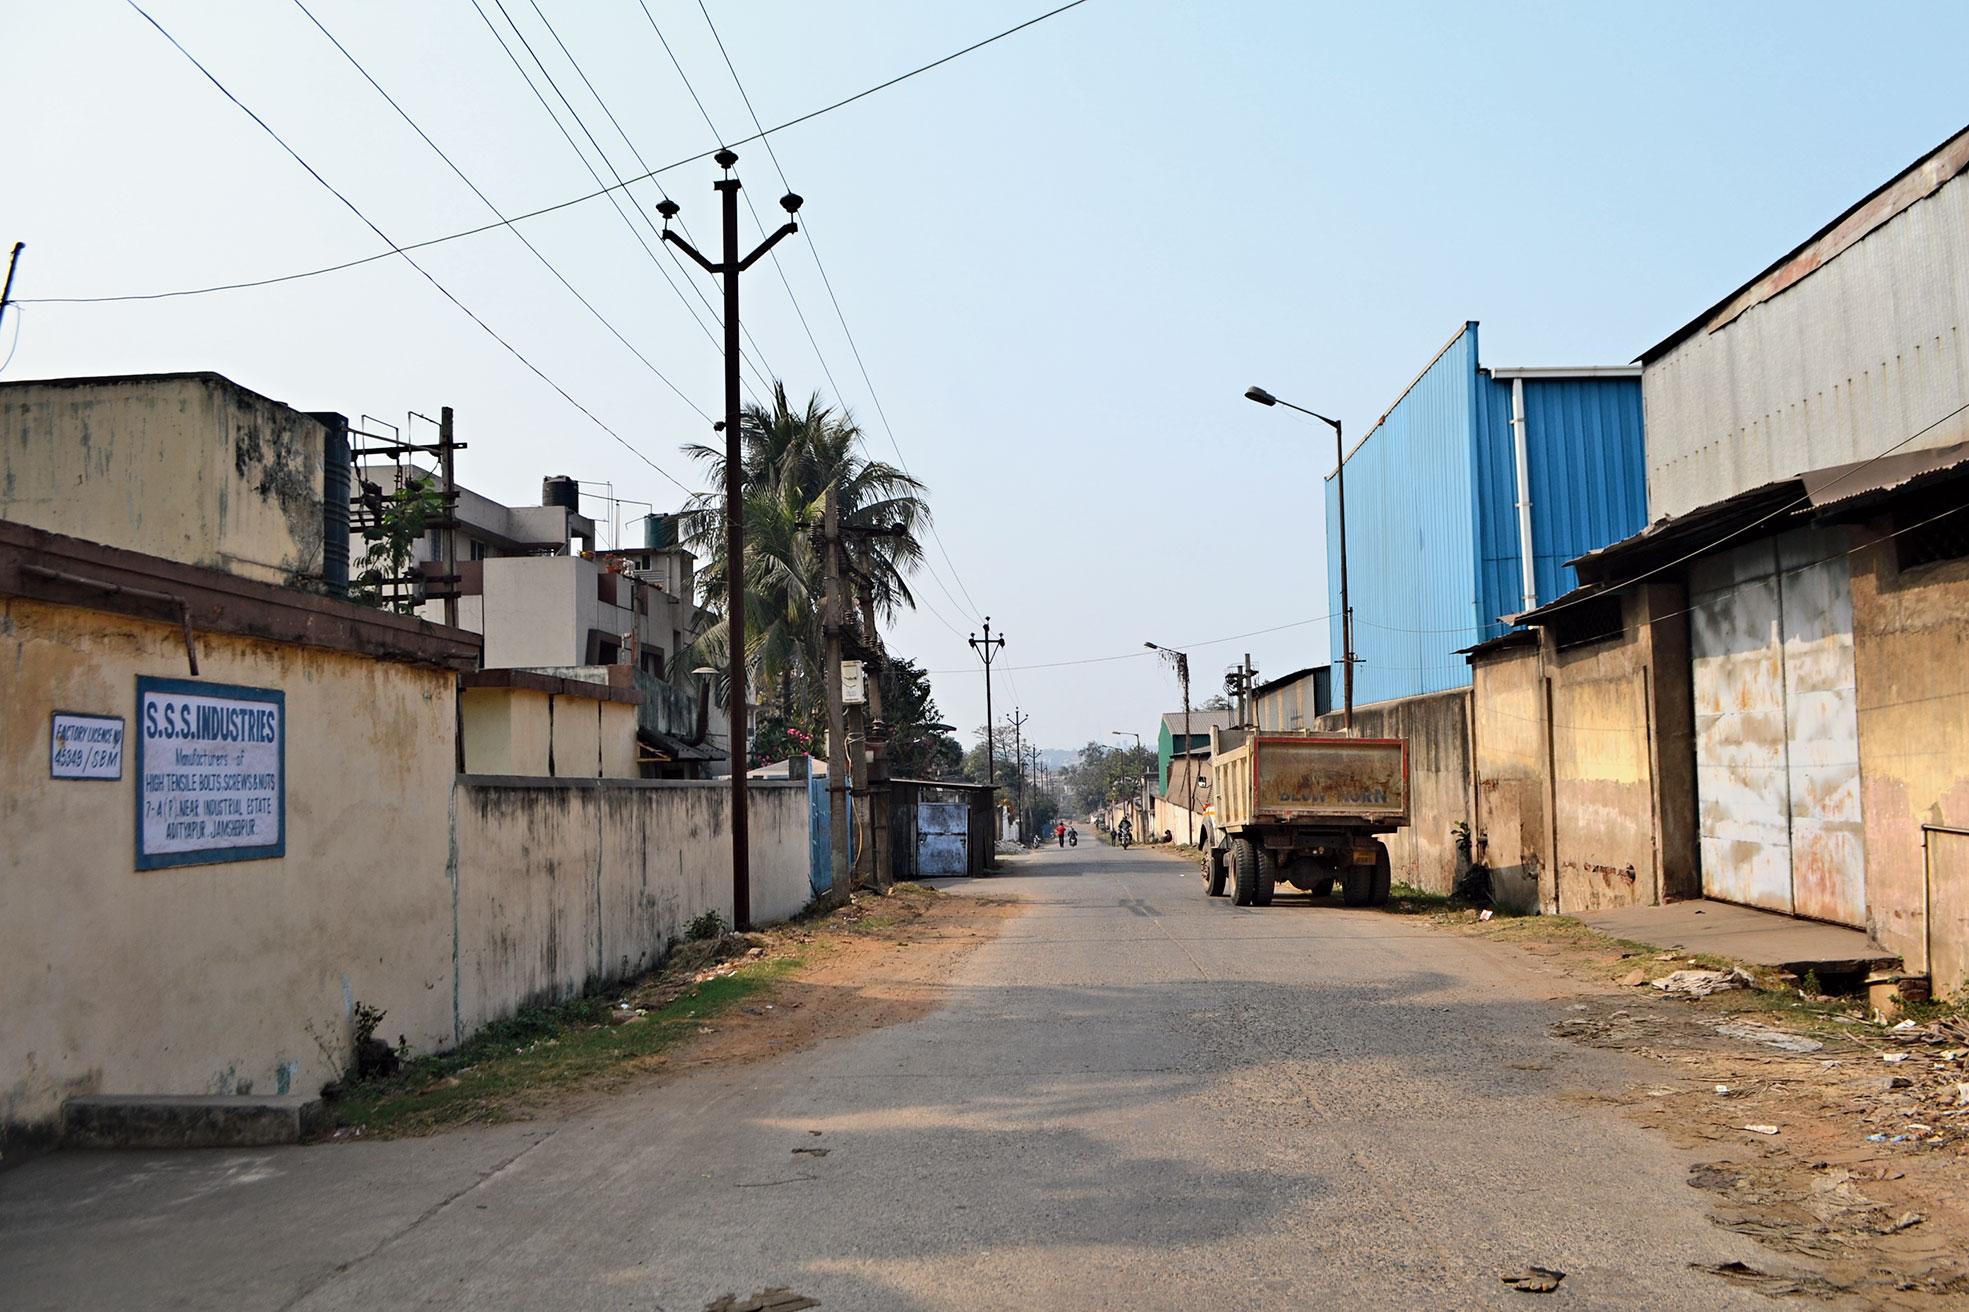 Adityapur industrial area.